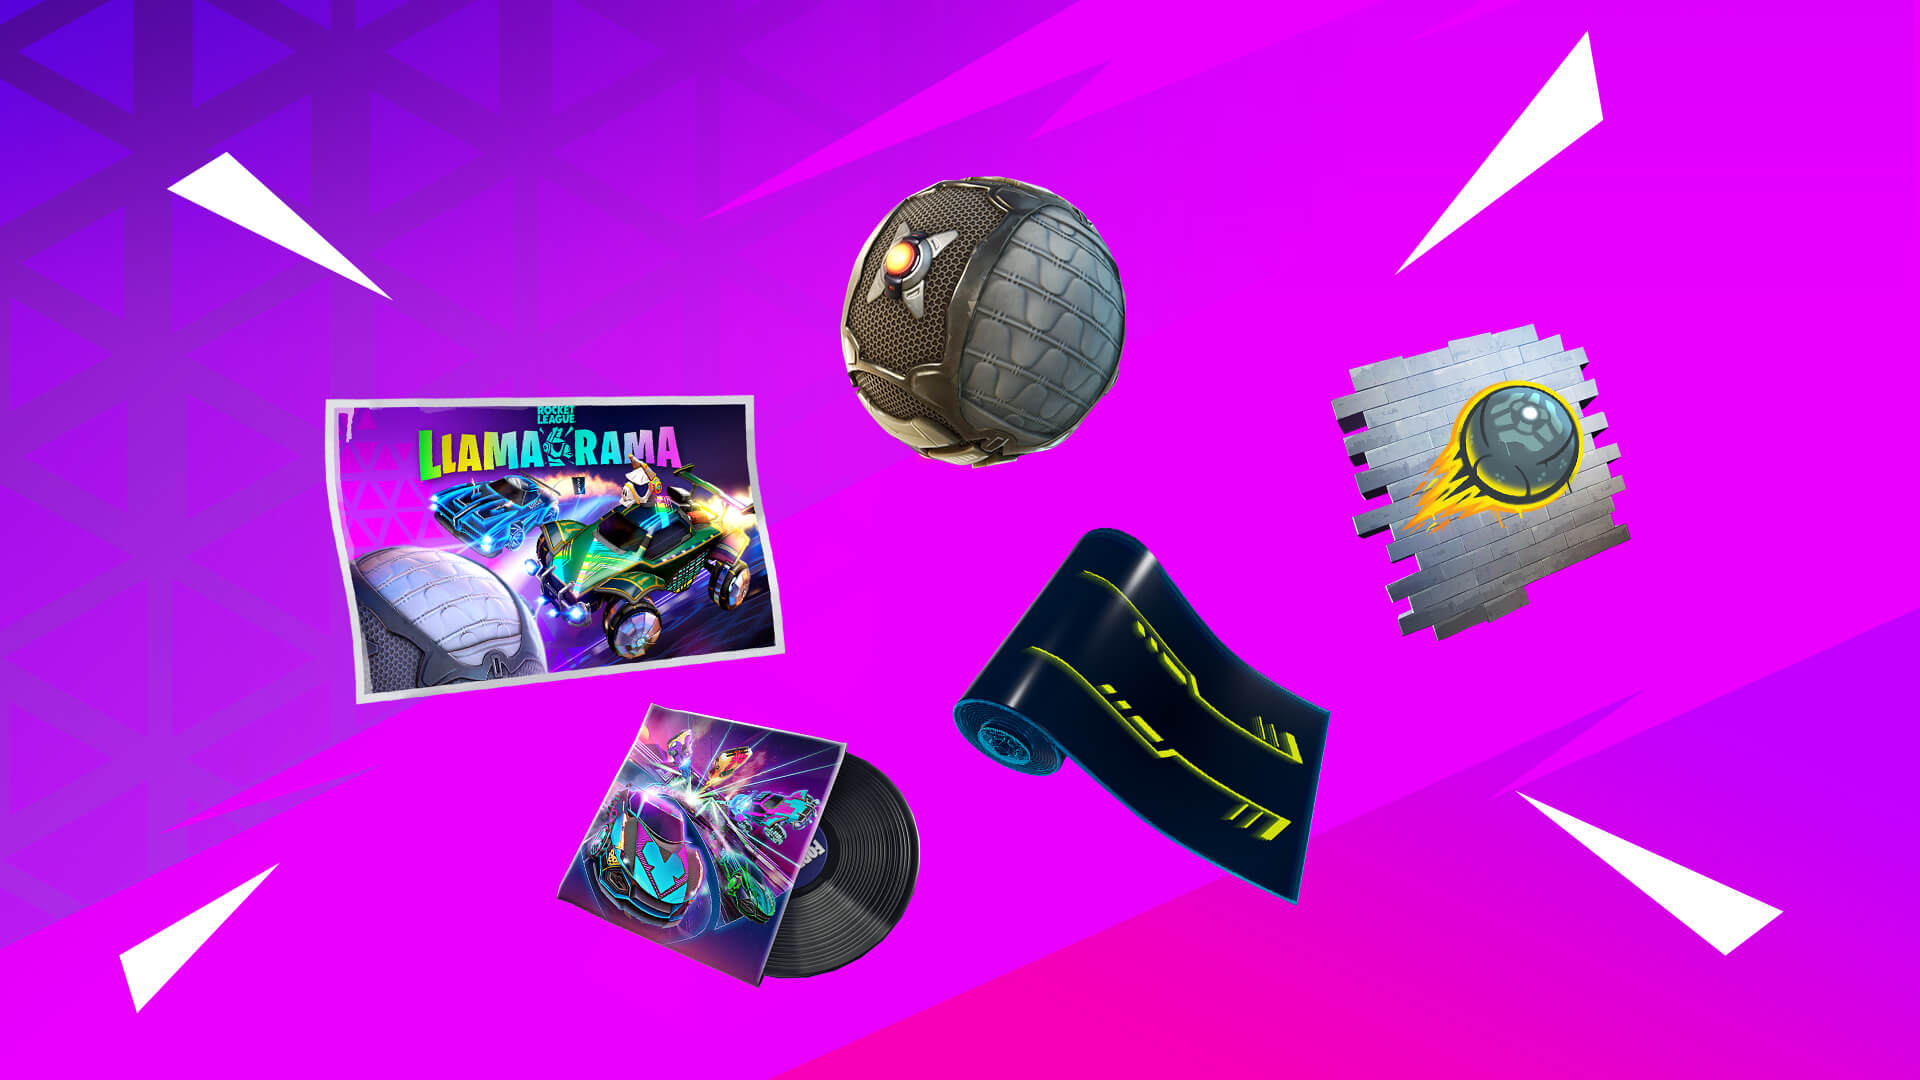 Fortnite: How to unlock the free Llama-Rama rewards